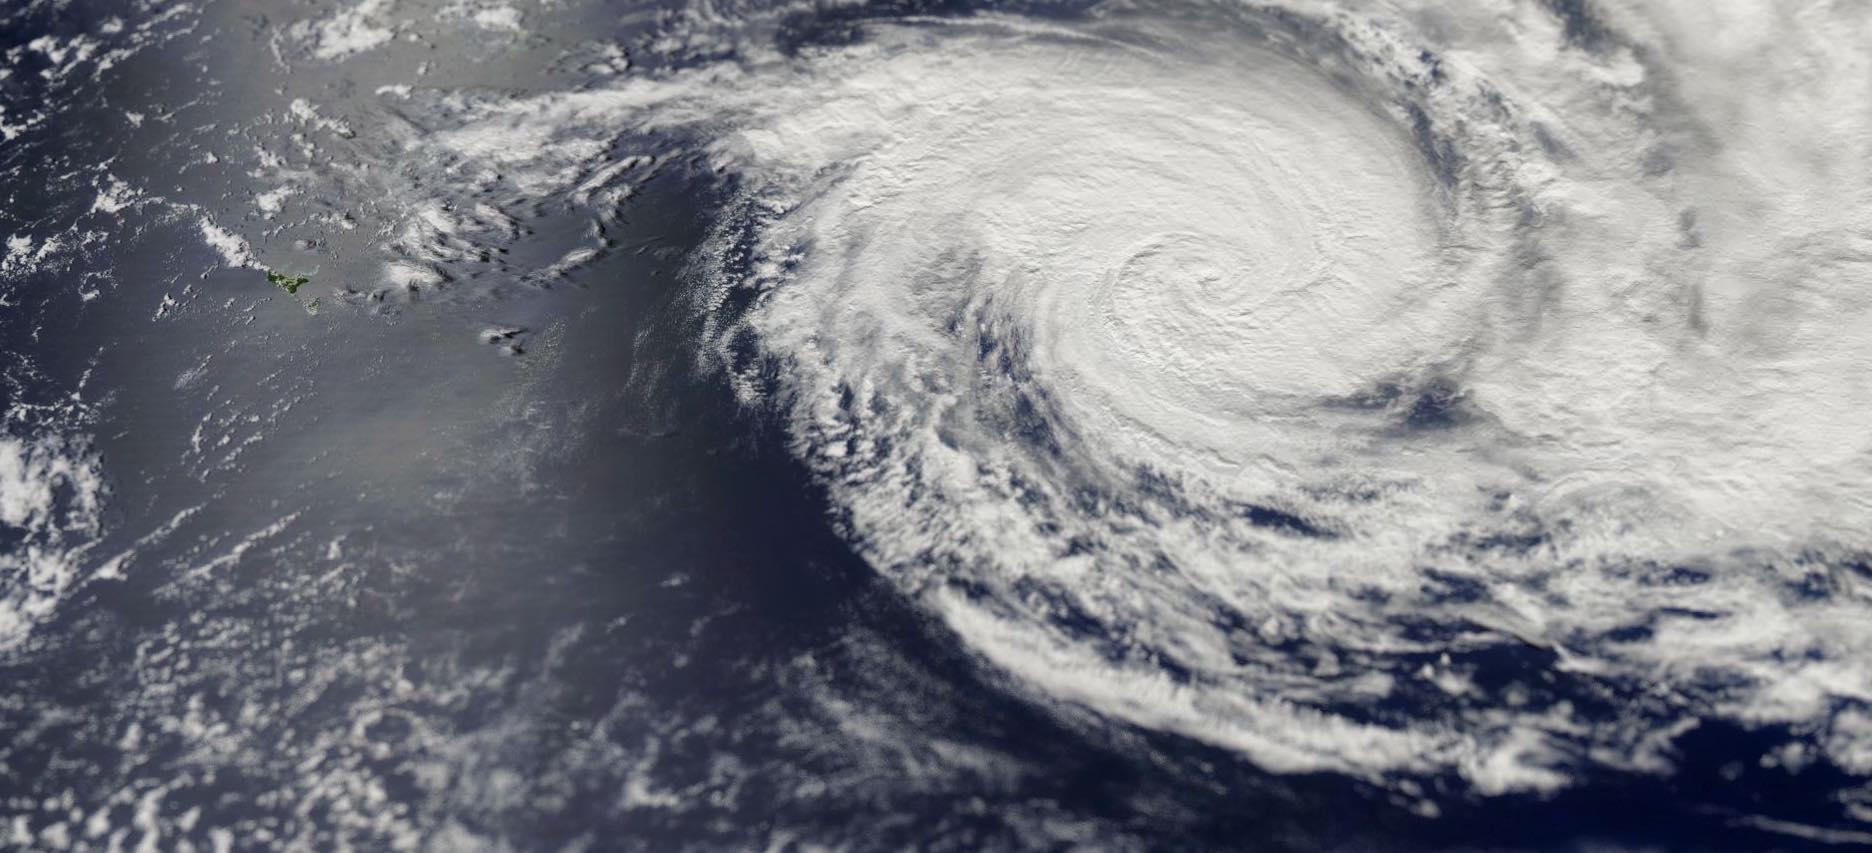 Tropical Cyclone Gita, 11 February 2018 (Photo: Antti Lipponen/Flickr)